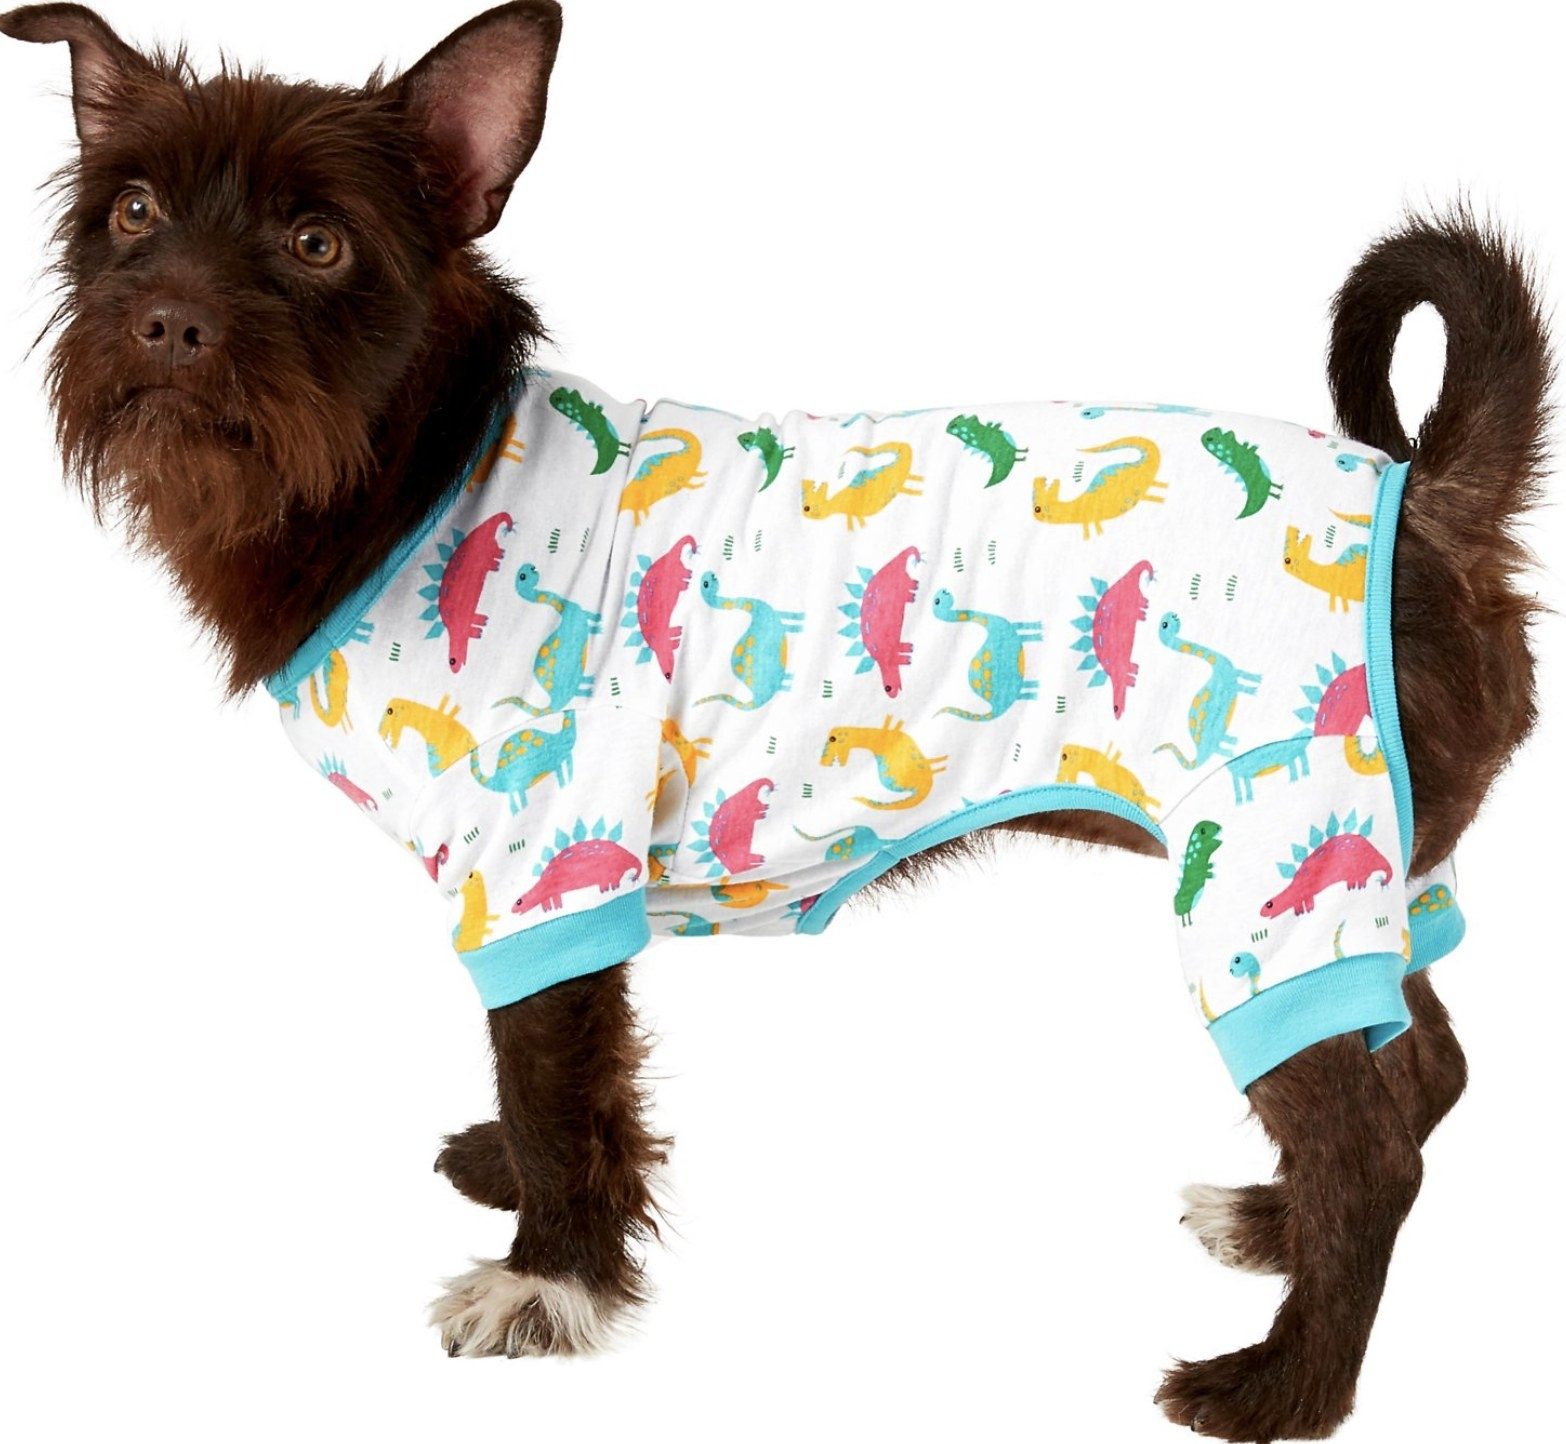 A dog wearing dinosaur pajamas